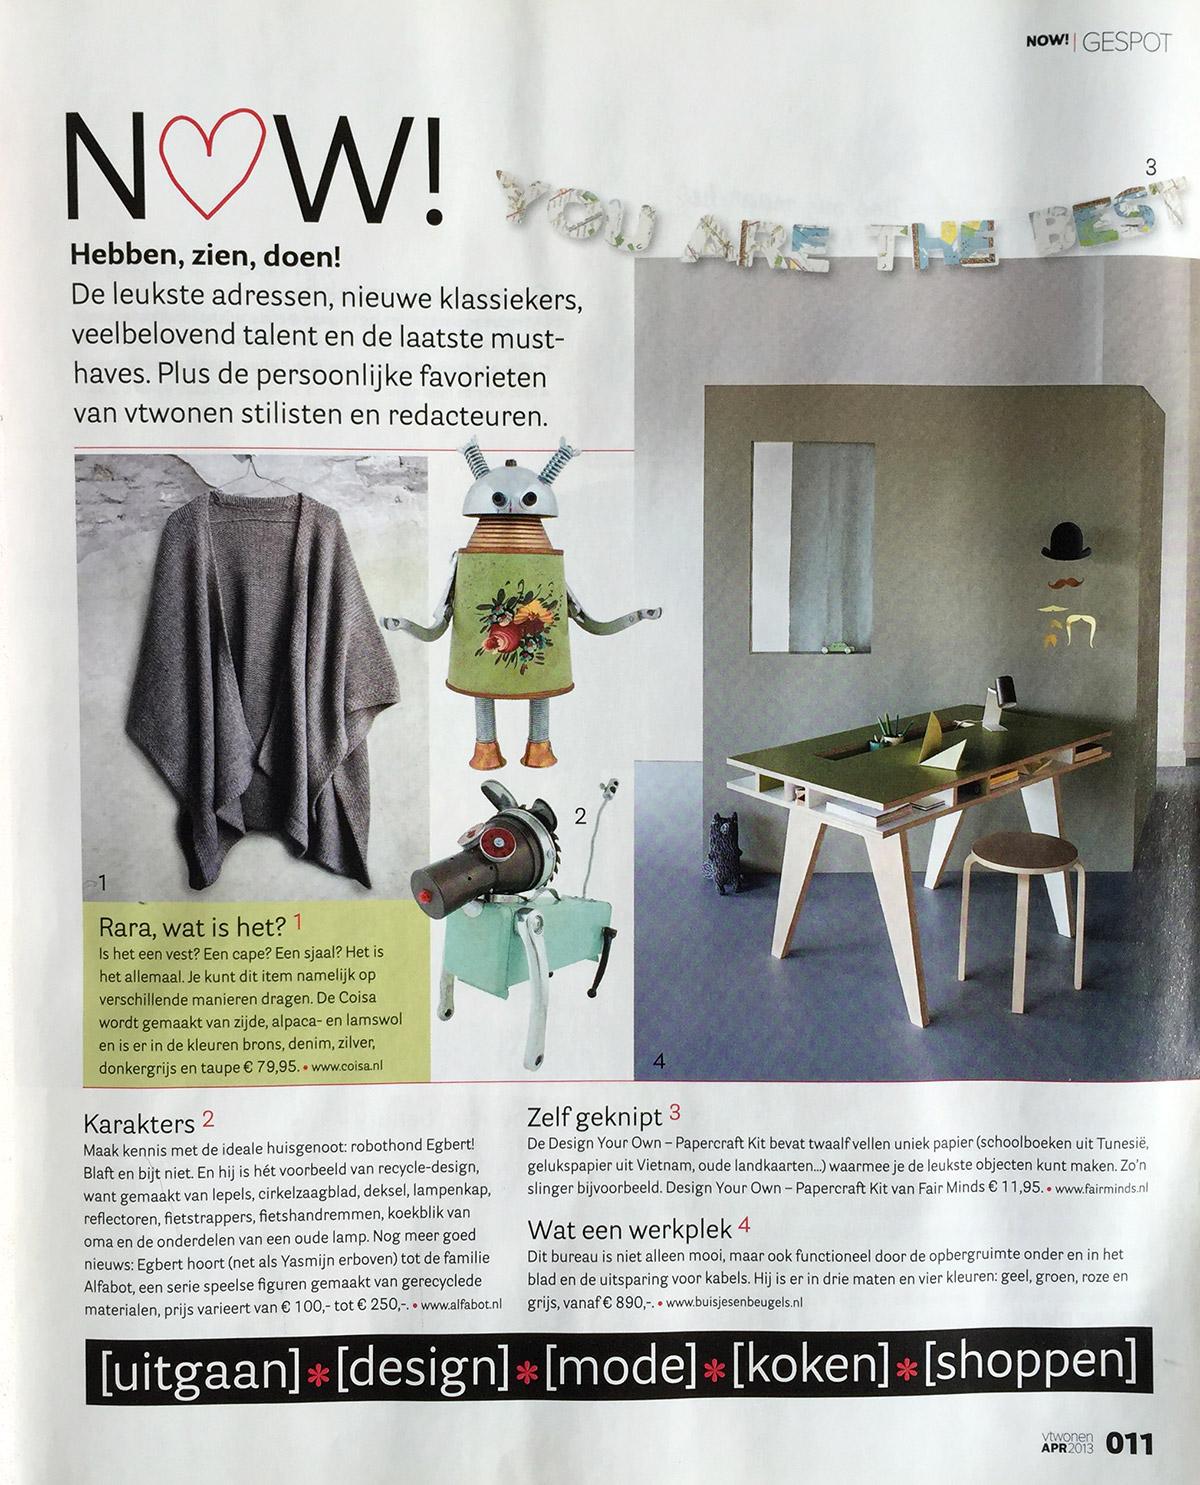 Prijs vt wonen magazine trendy andalusia travelcard in vt for Vtwonen abonnement